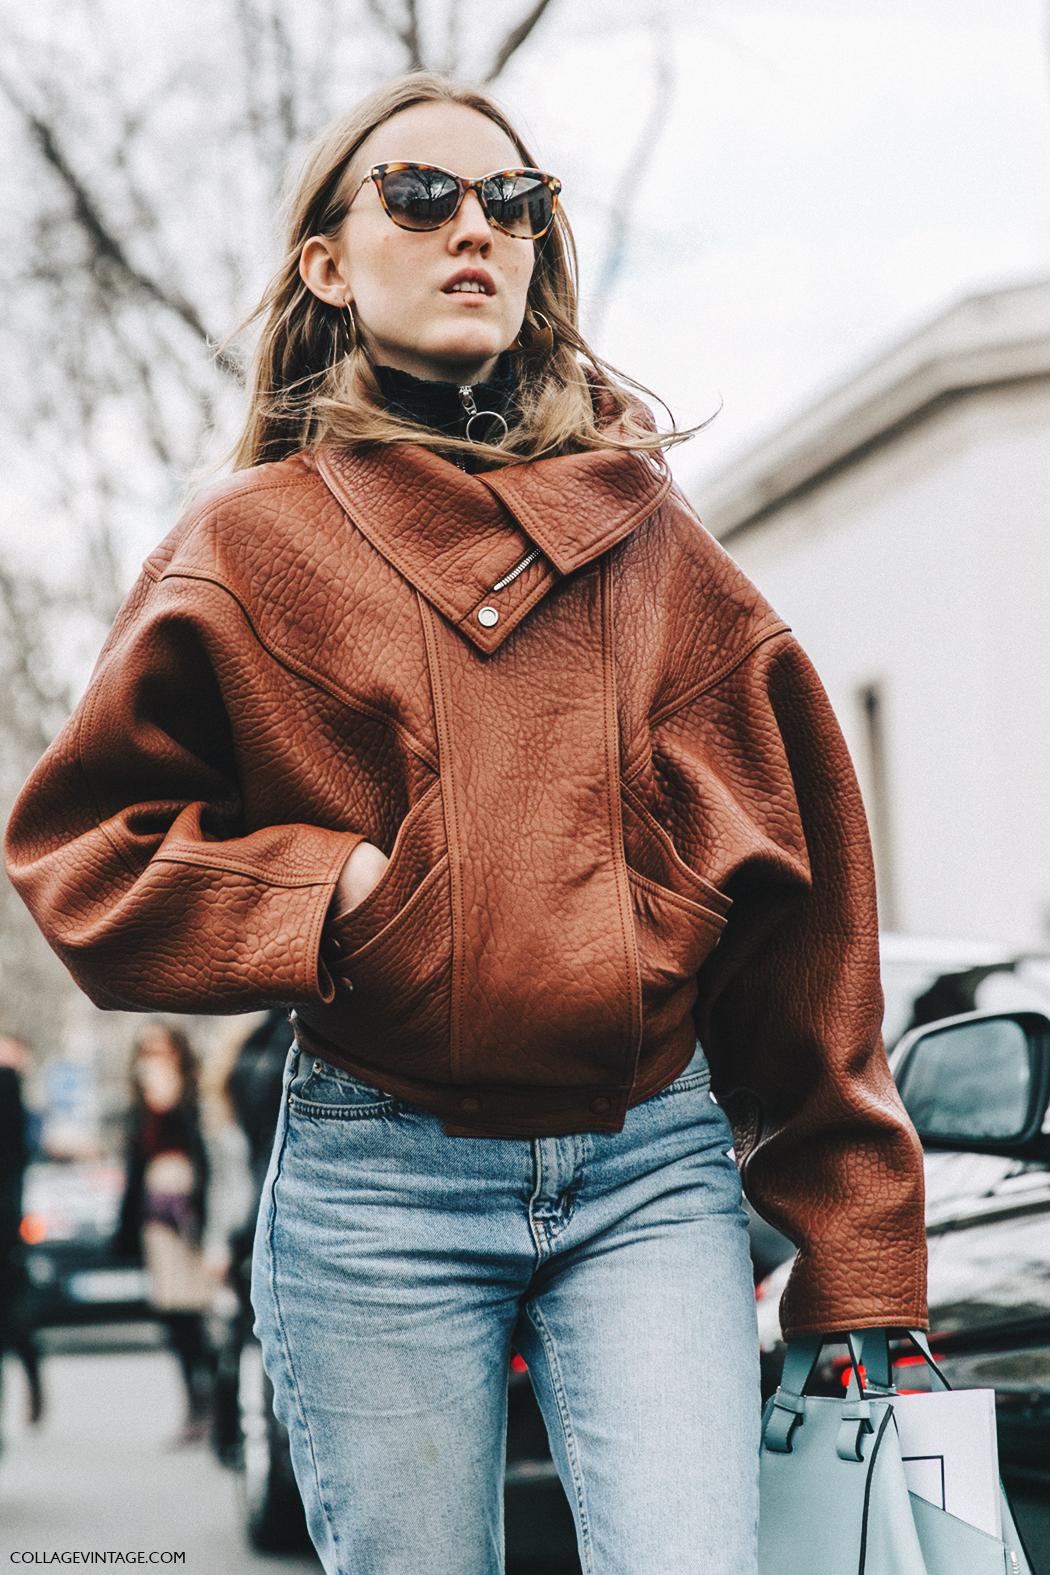 PFW-Paris_Fashion_Week_Fall_2016-Street_Style-Collage_Vintage-Alexandra_Carl-Leather_Jacket-Celine_Boots-